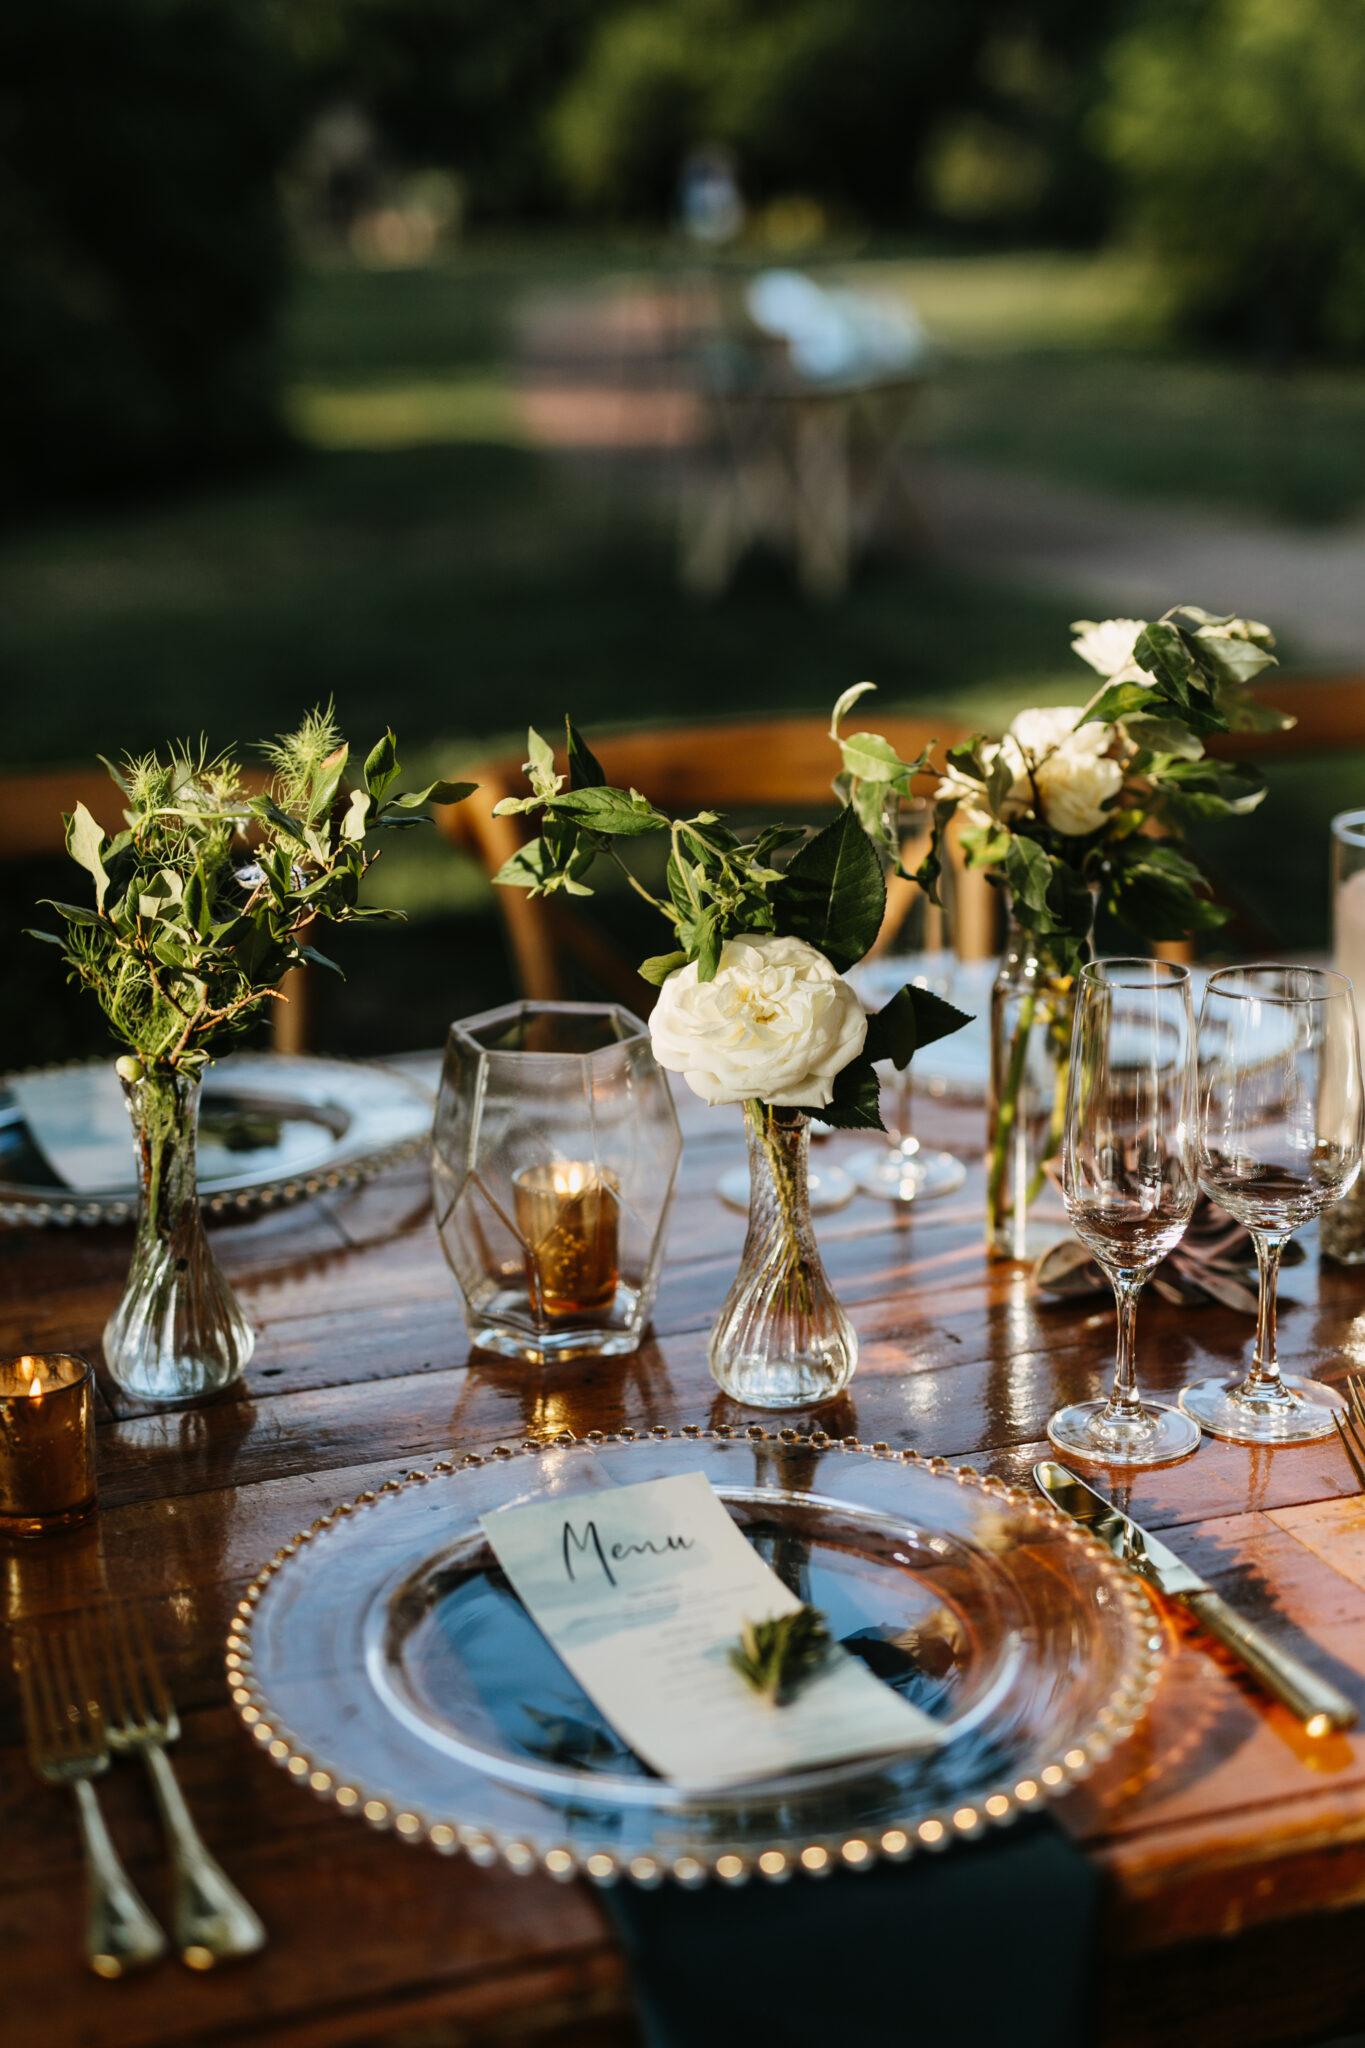 place setting at long table at farm wedding